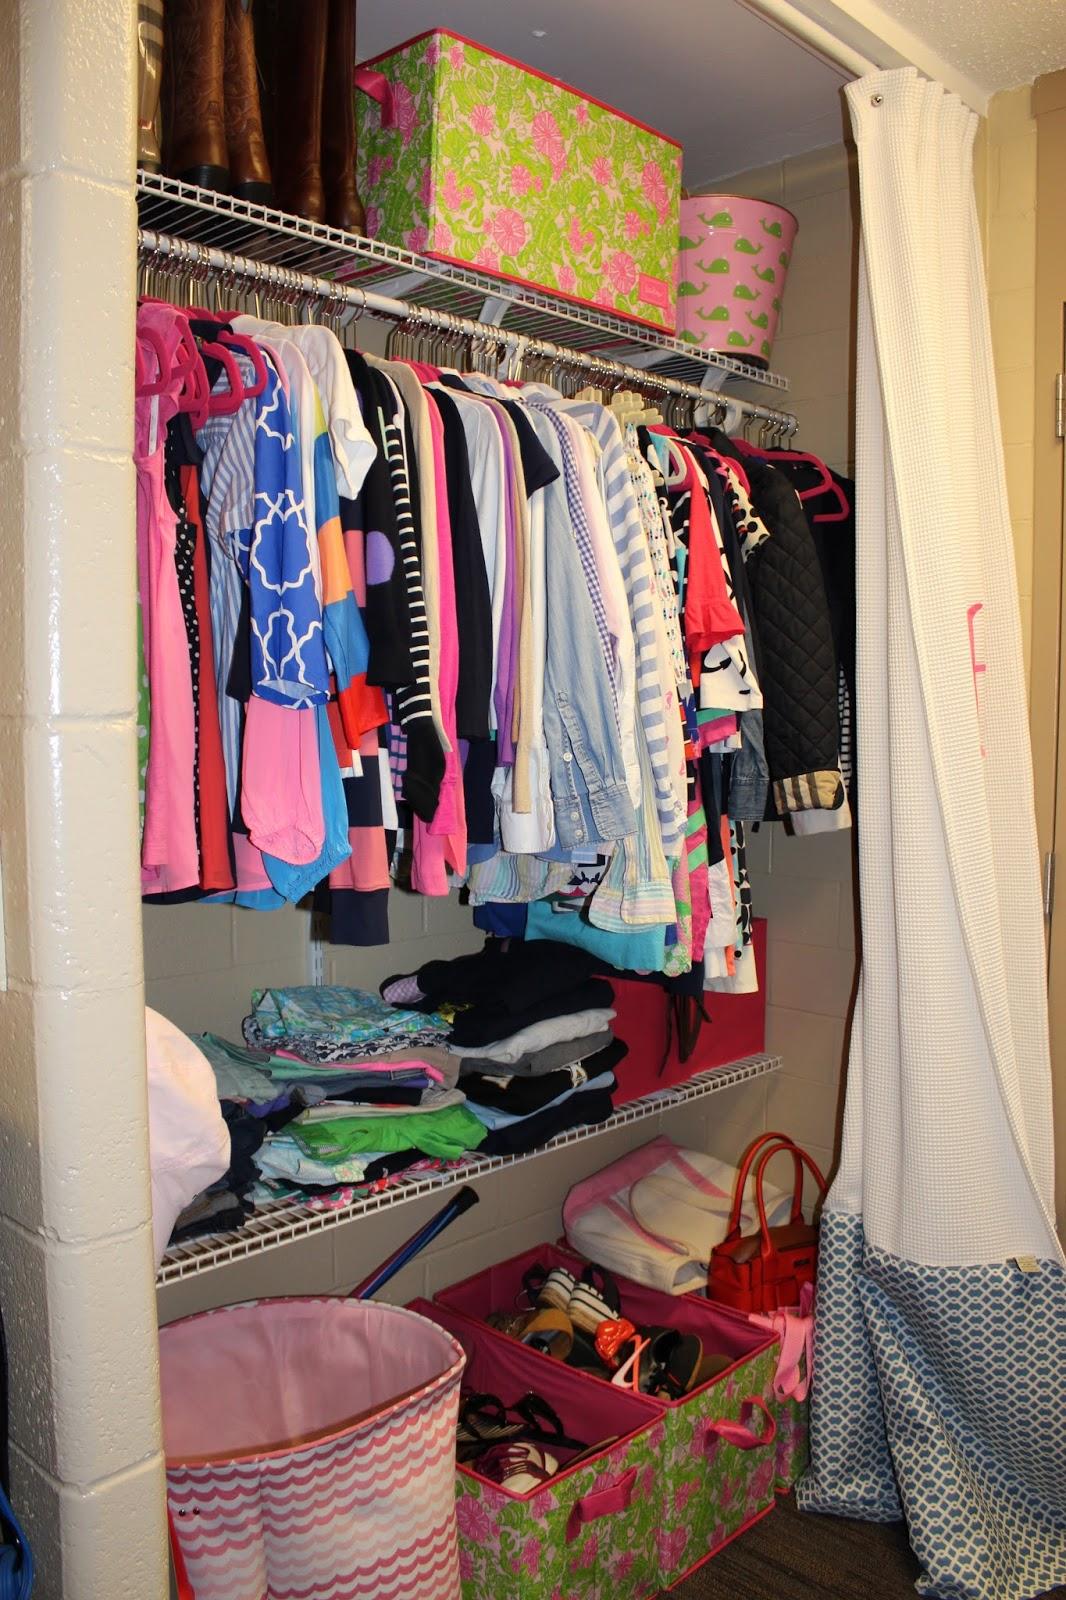 Dorm Room Closet: 2 Preps & A Dorm Room